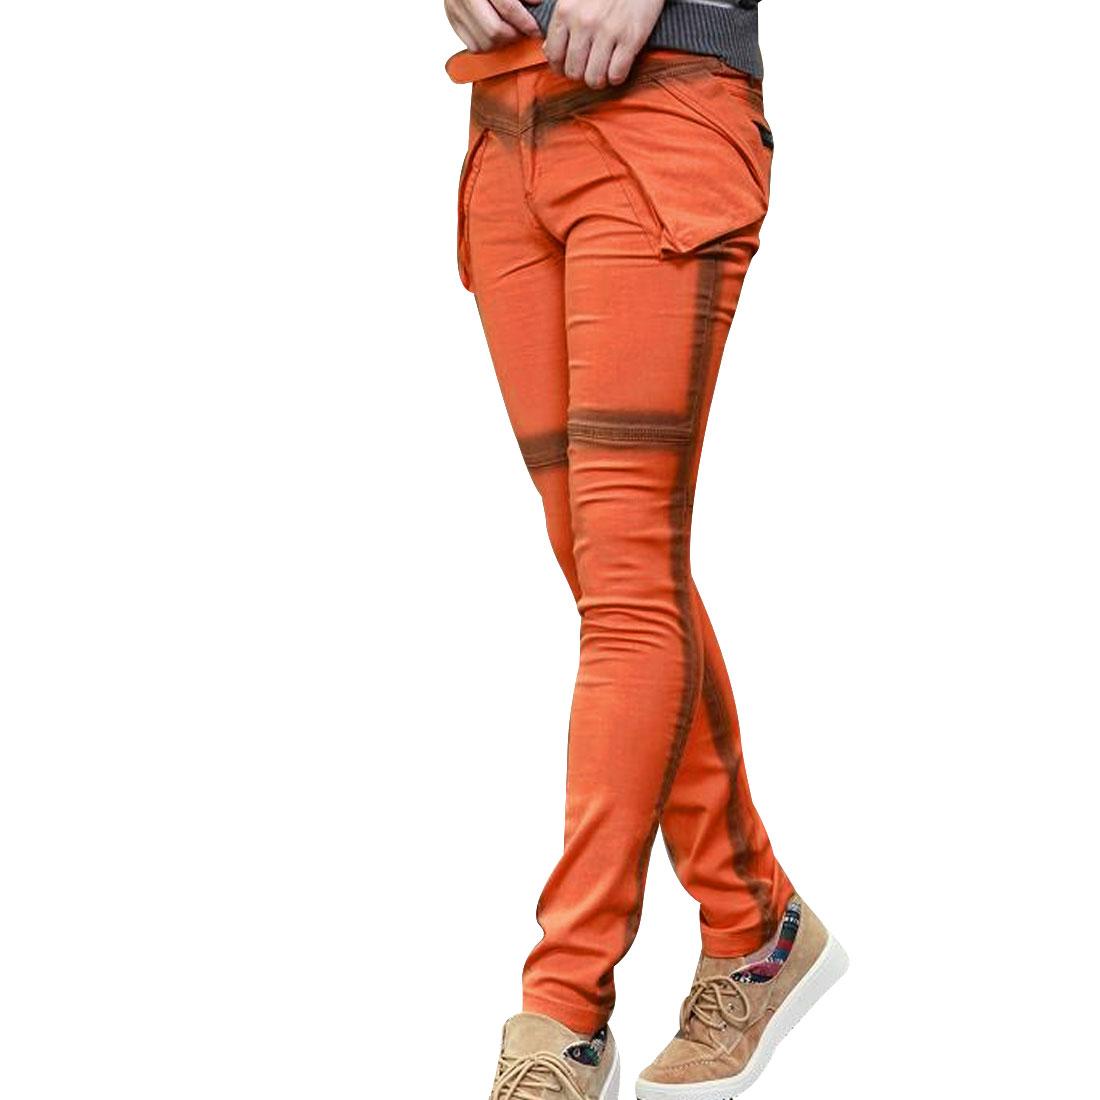 New Fading Orange Slant Pocket Zip Hip Pocket Slim Trousers For Men W30